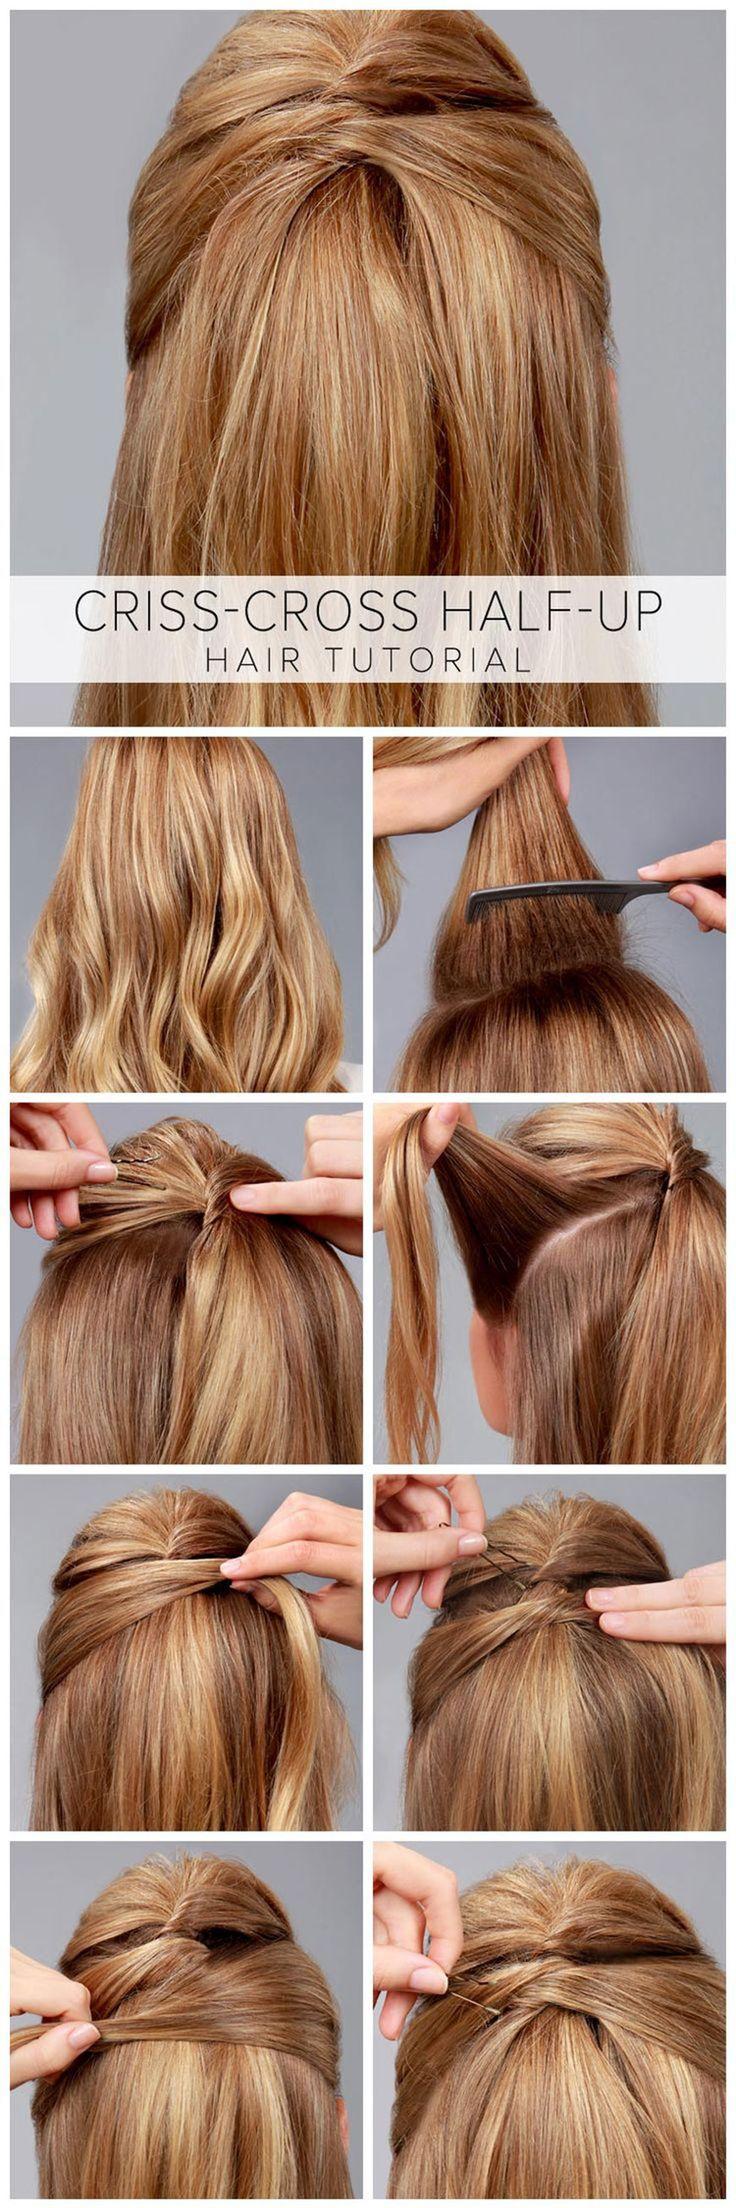 Swell 1000 Ideas About Easy Wedding Hairstyles On Pinterest Short Short Hairstyles Gunalazisus